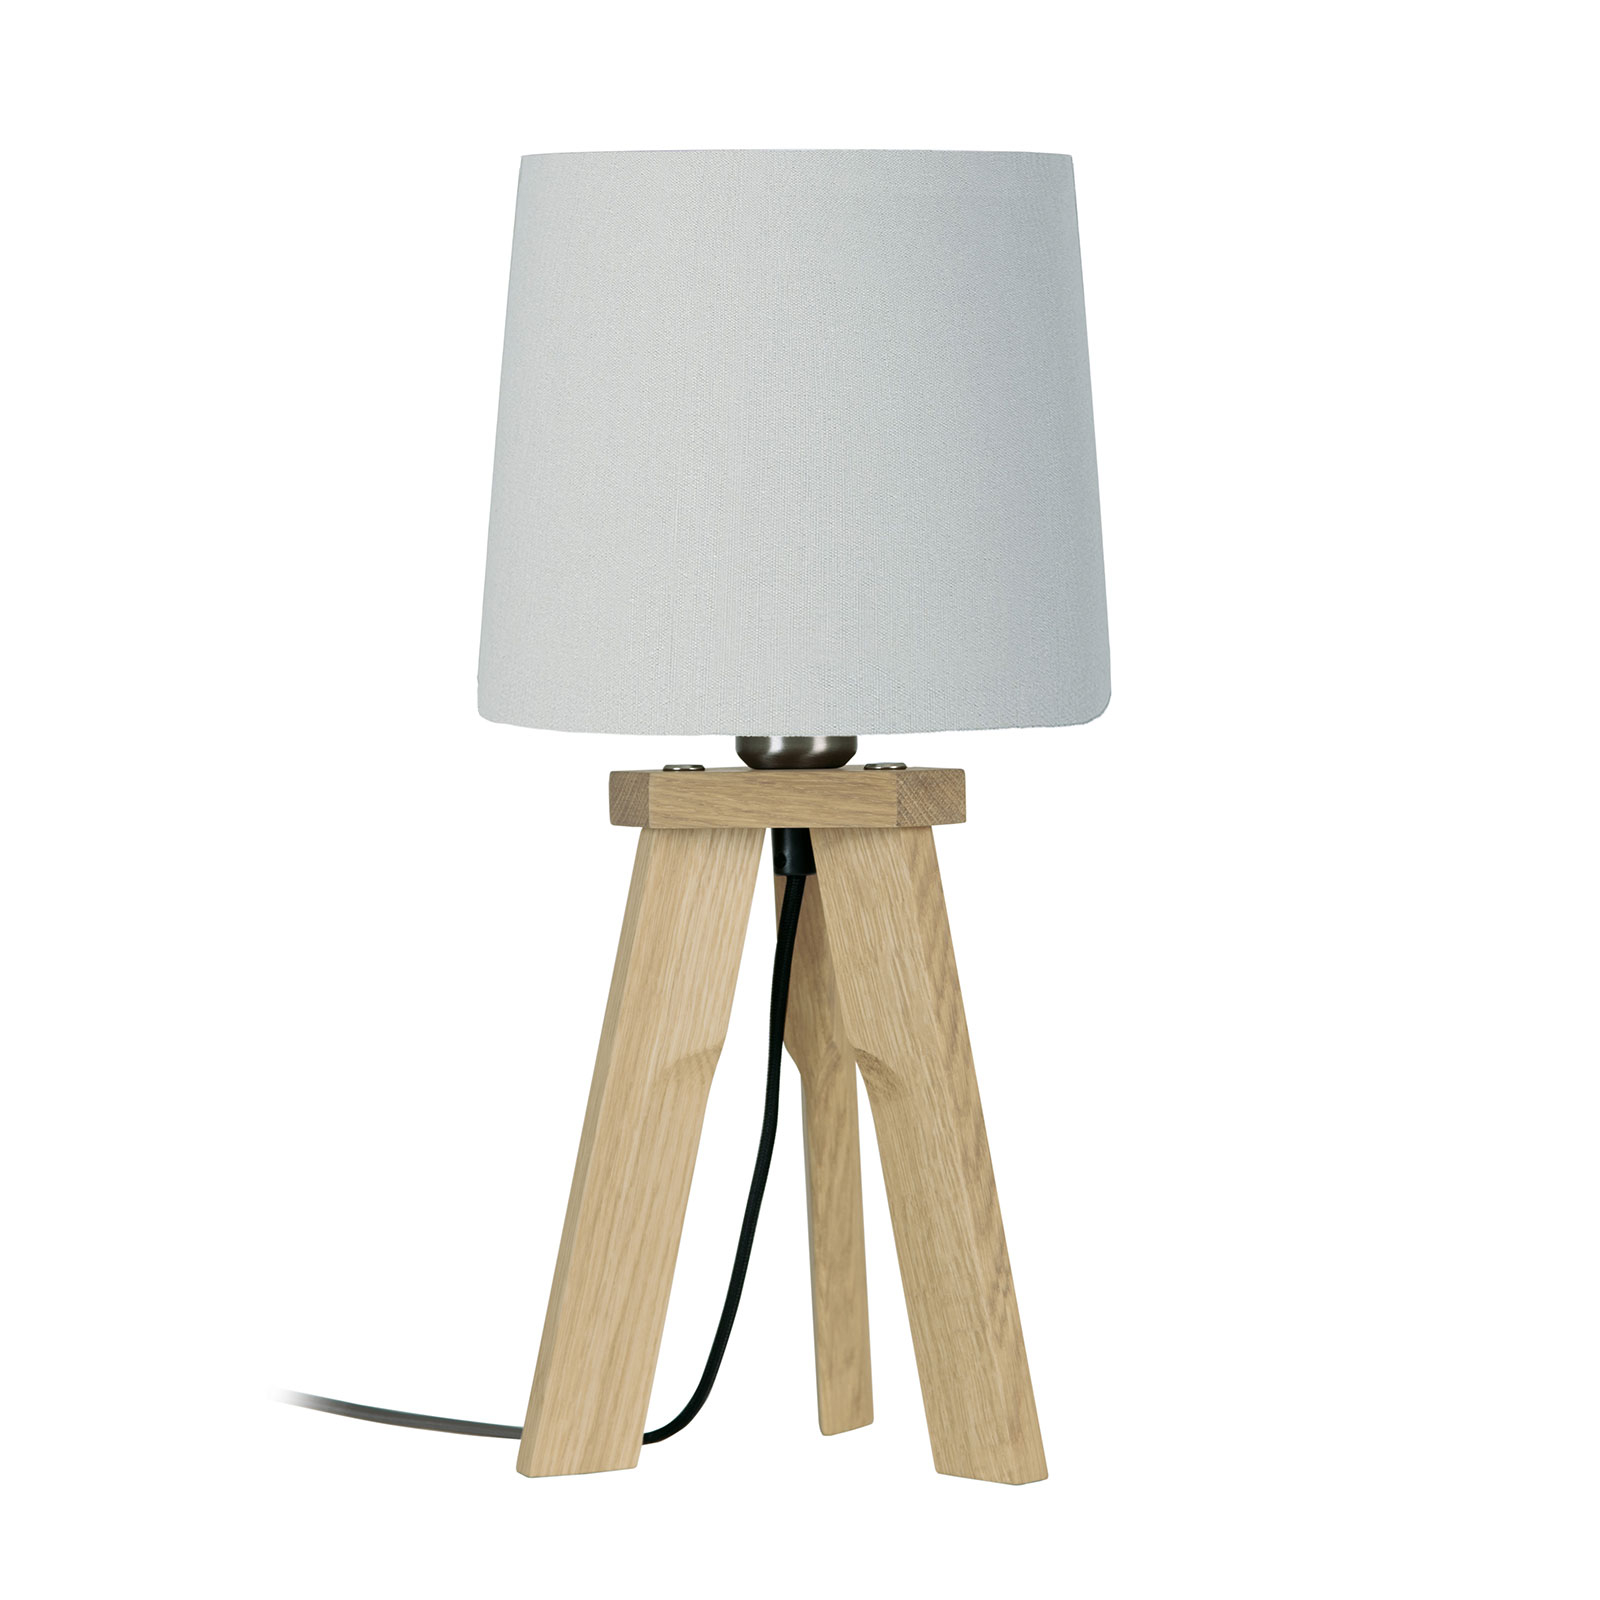 HerzBlut Tre tafellamp, eiken natuur, wit, 42cm